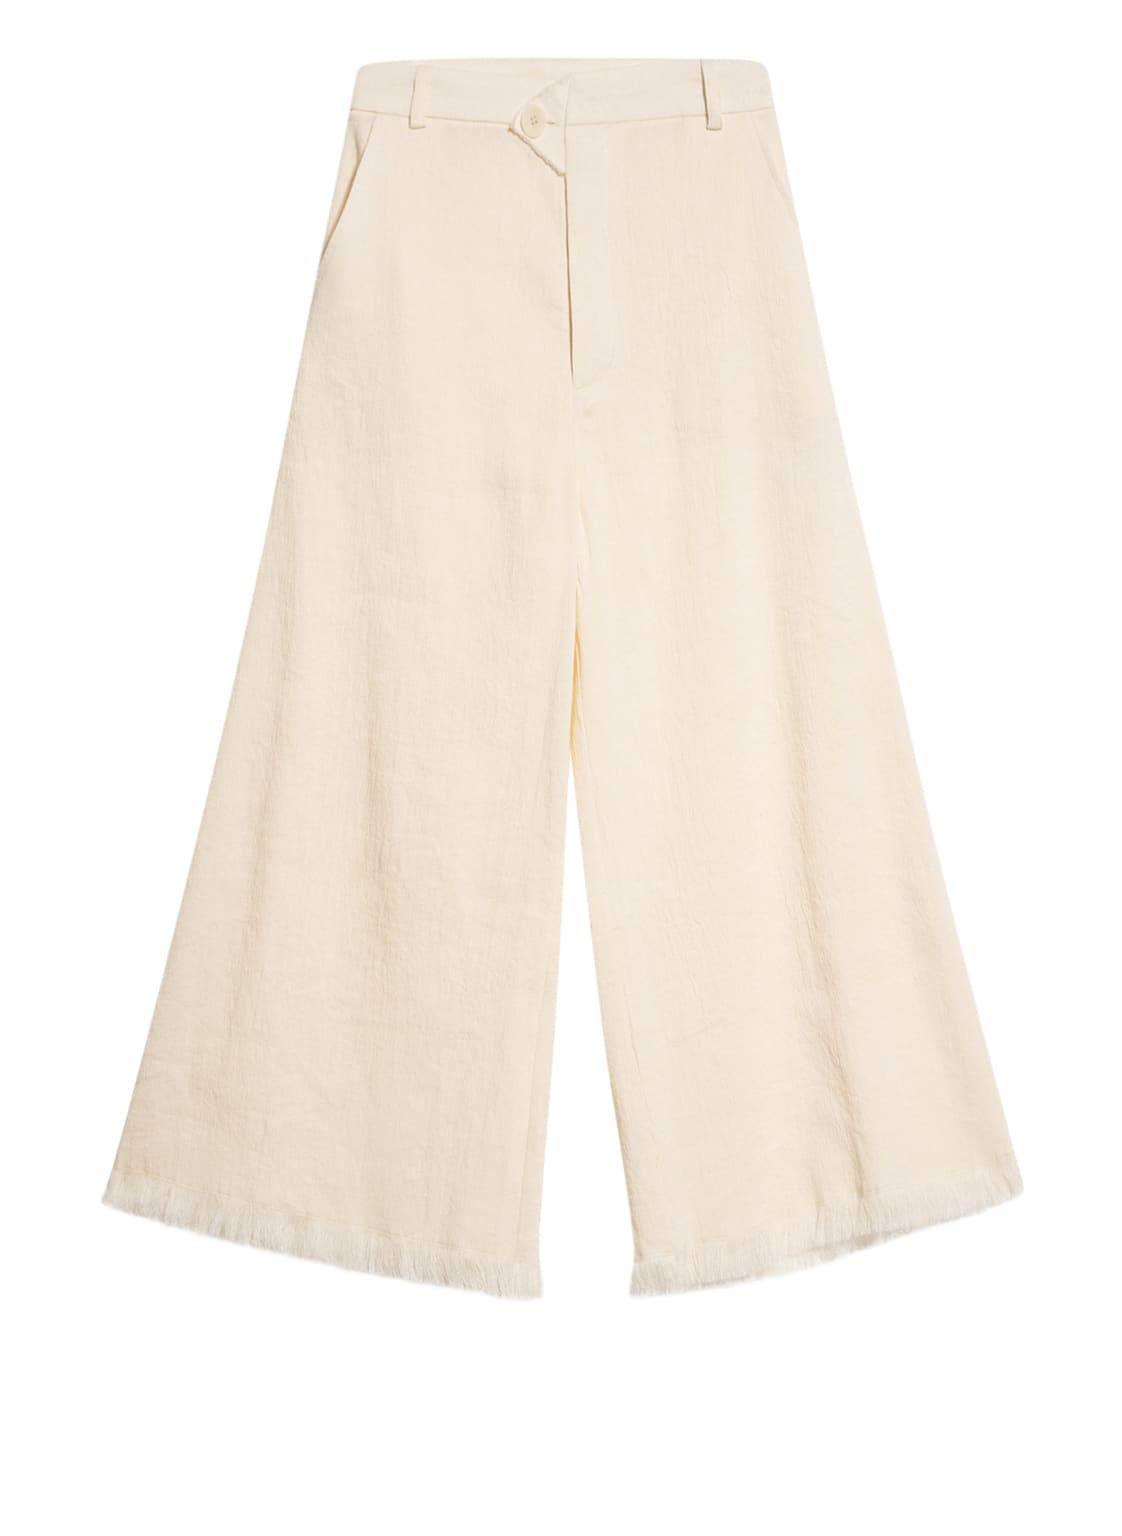 Image of Aeron Culotte Epos beige